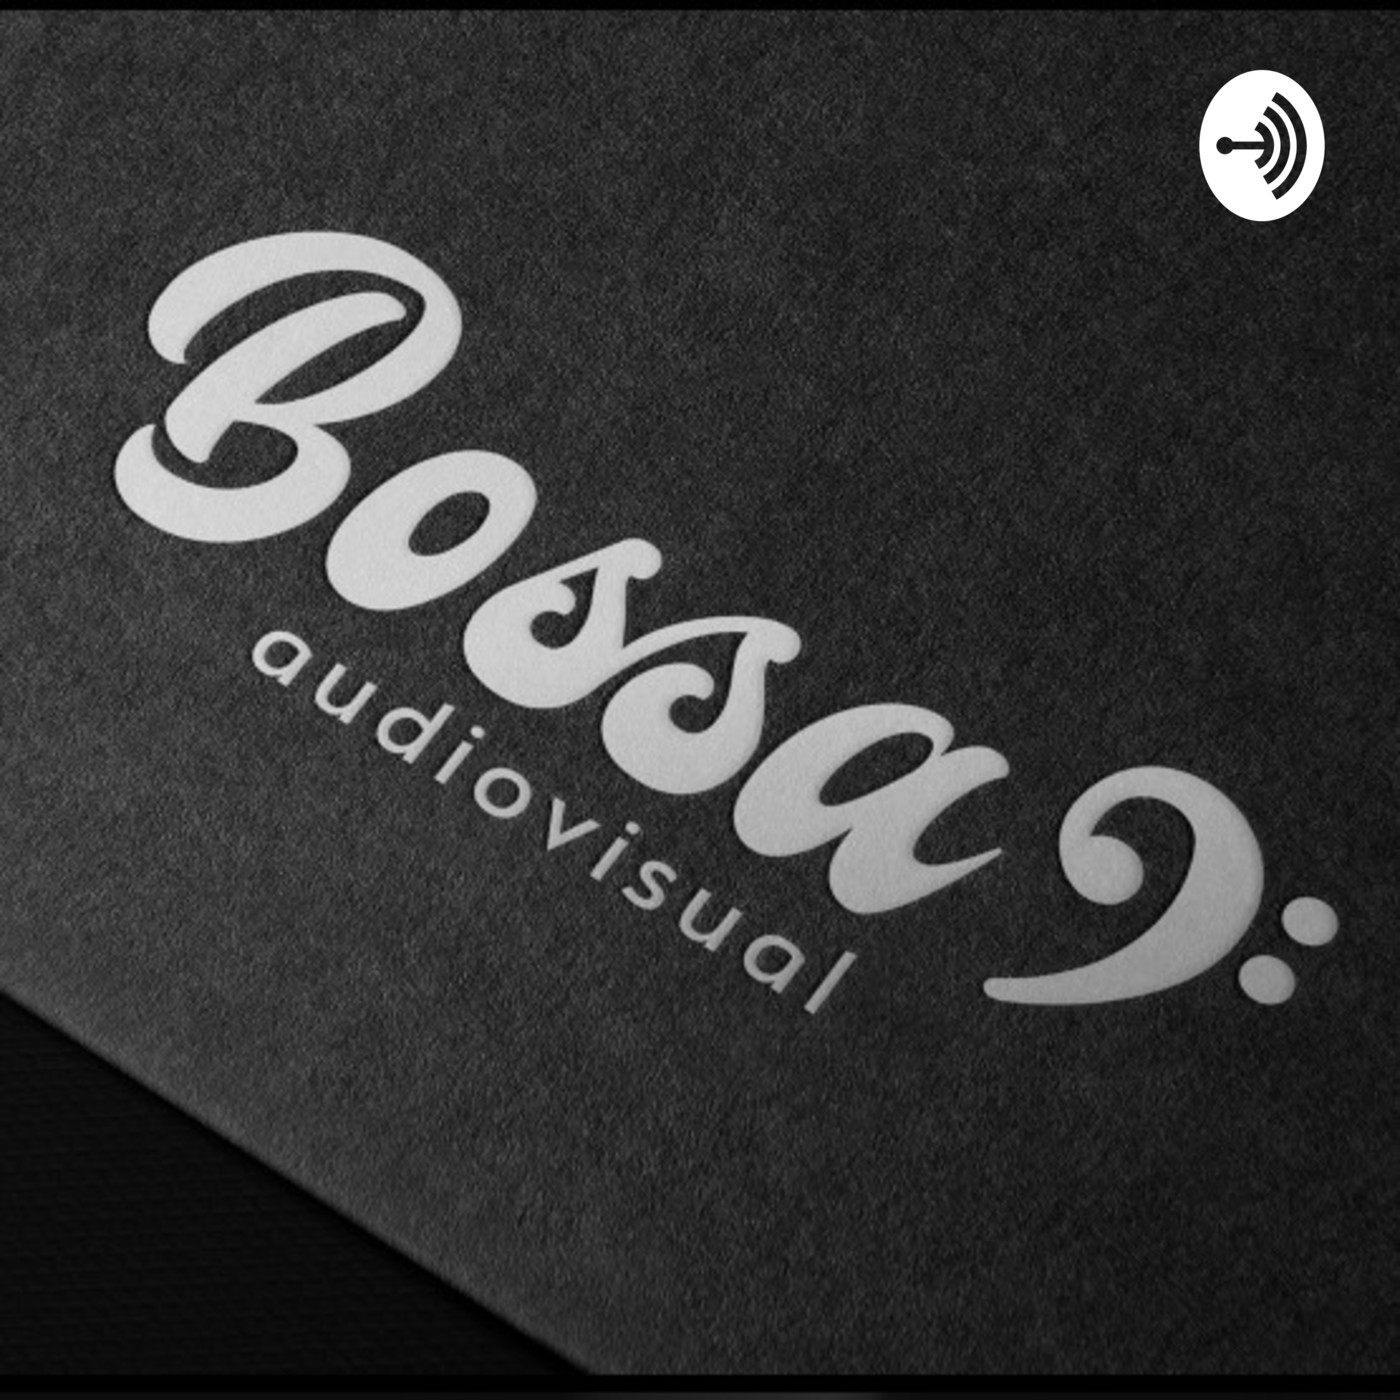 Bossa 9 Audiovisual